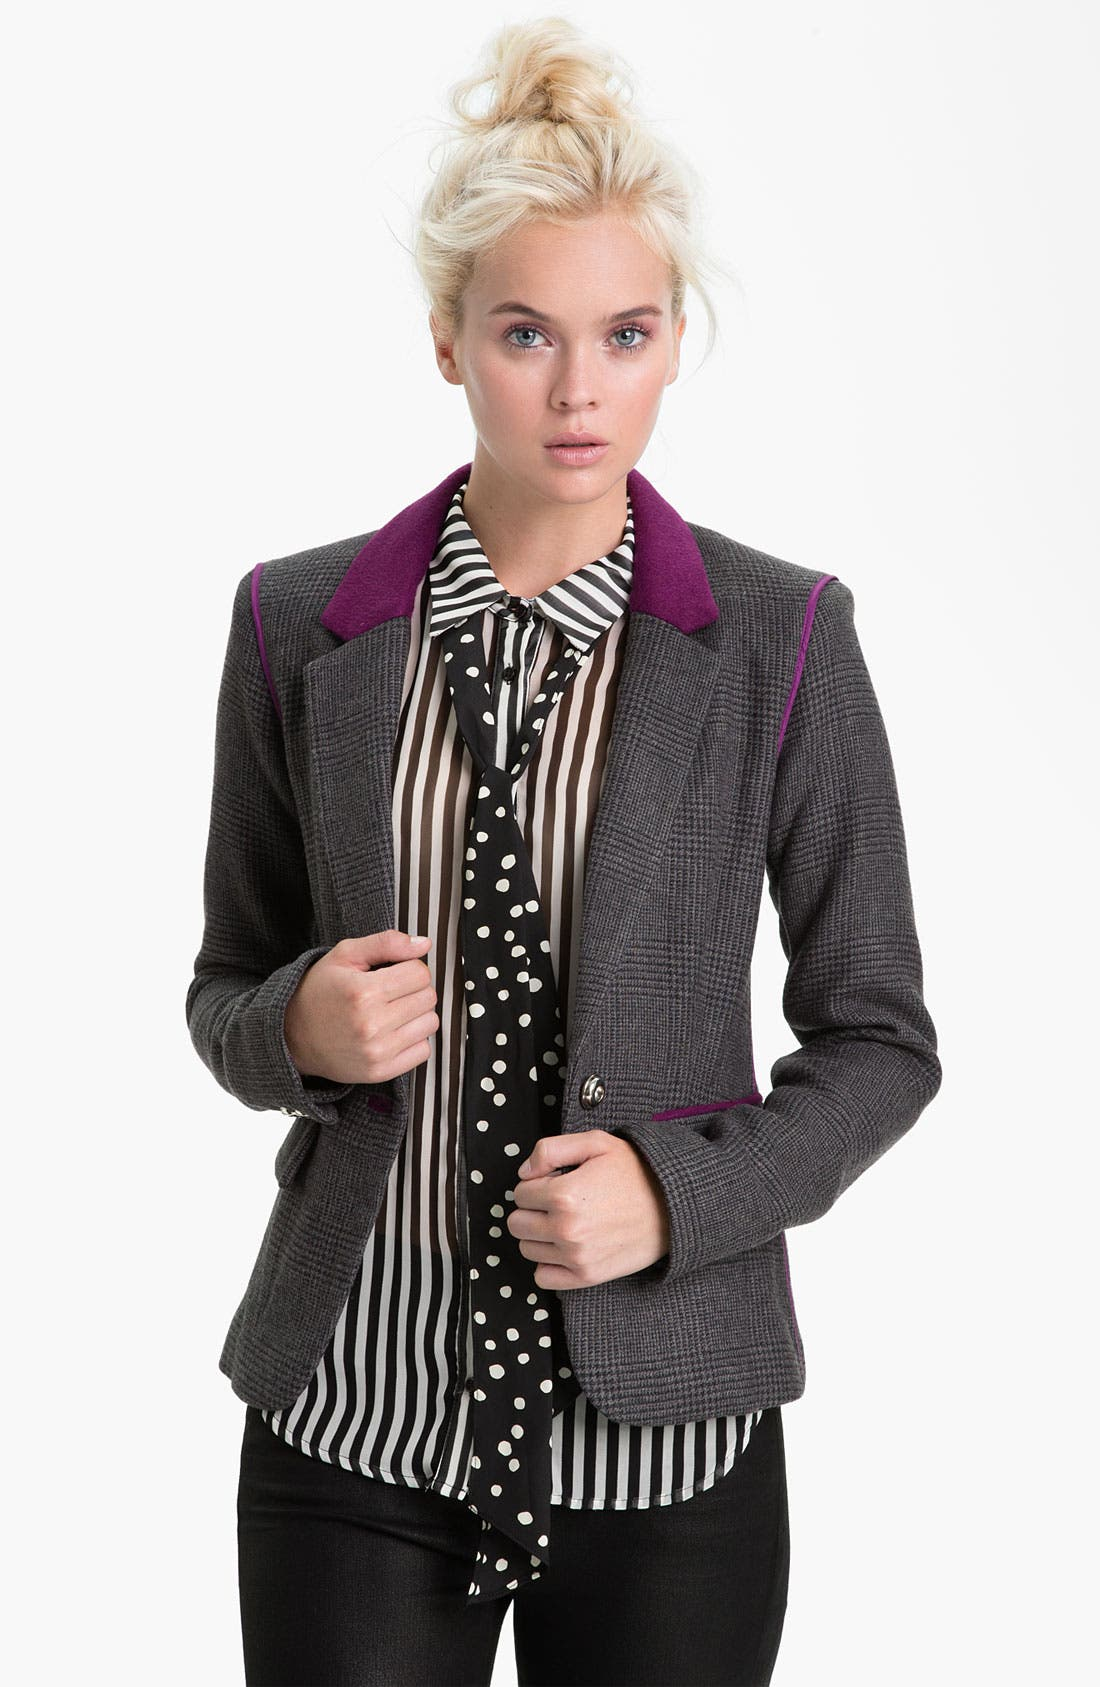 Alternate Image 1 Selected - Juicy Couture Contrast Trim Plaid Blazer